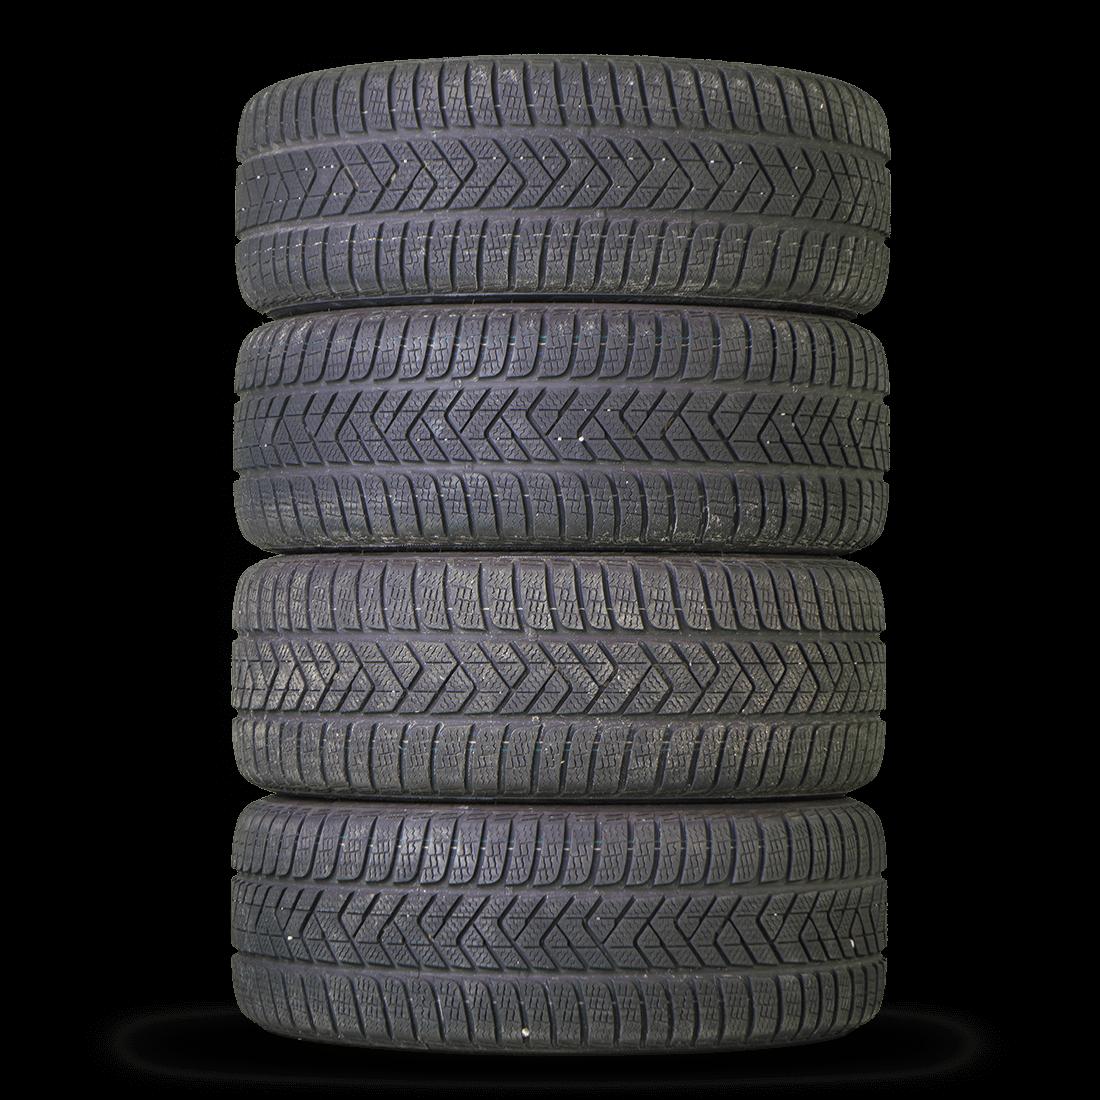 Audi 18 Inch Rims A4 S4 B9 8W Aluminum Rims Winter Tires